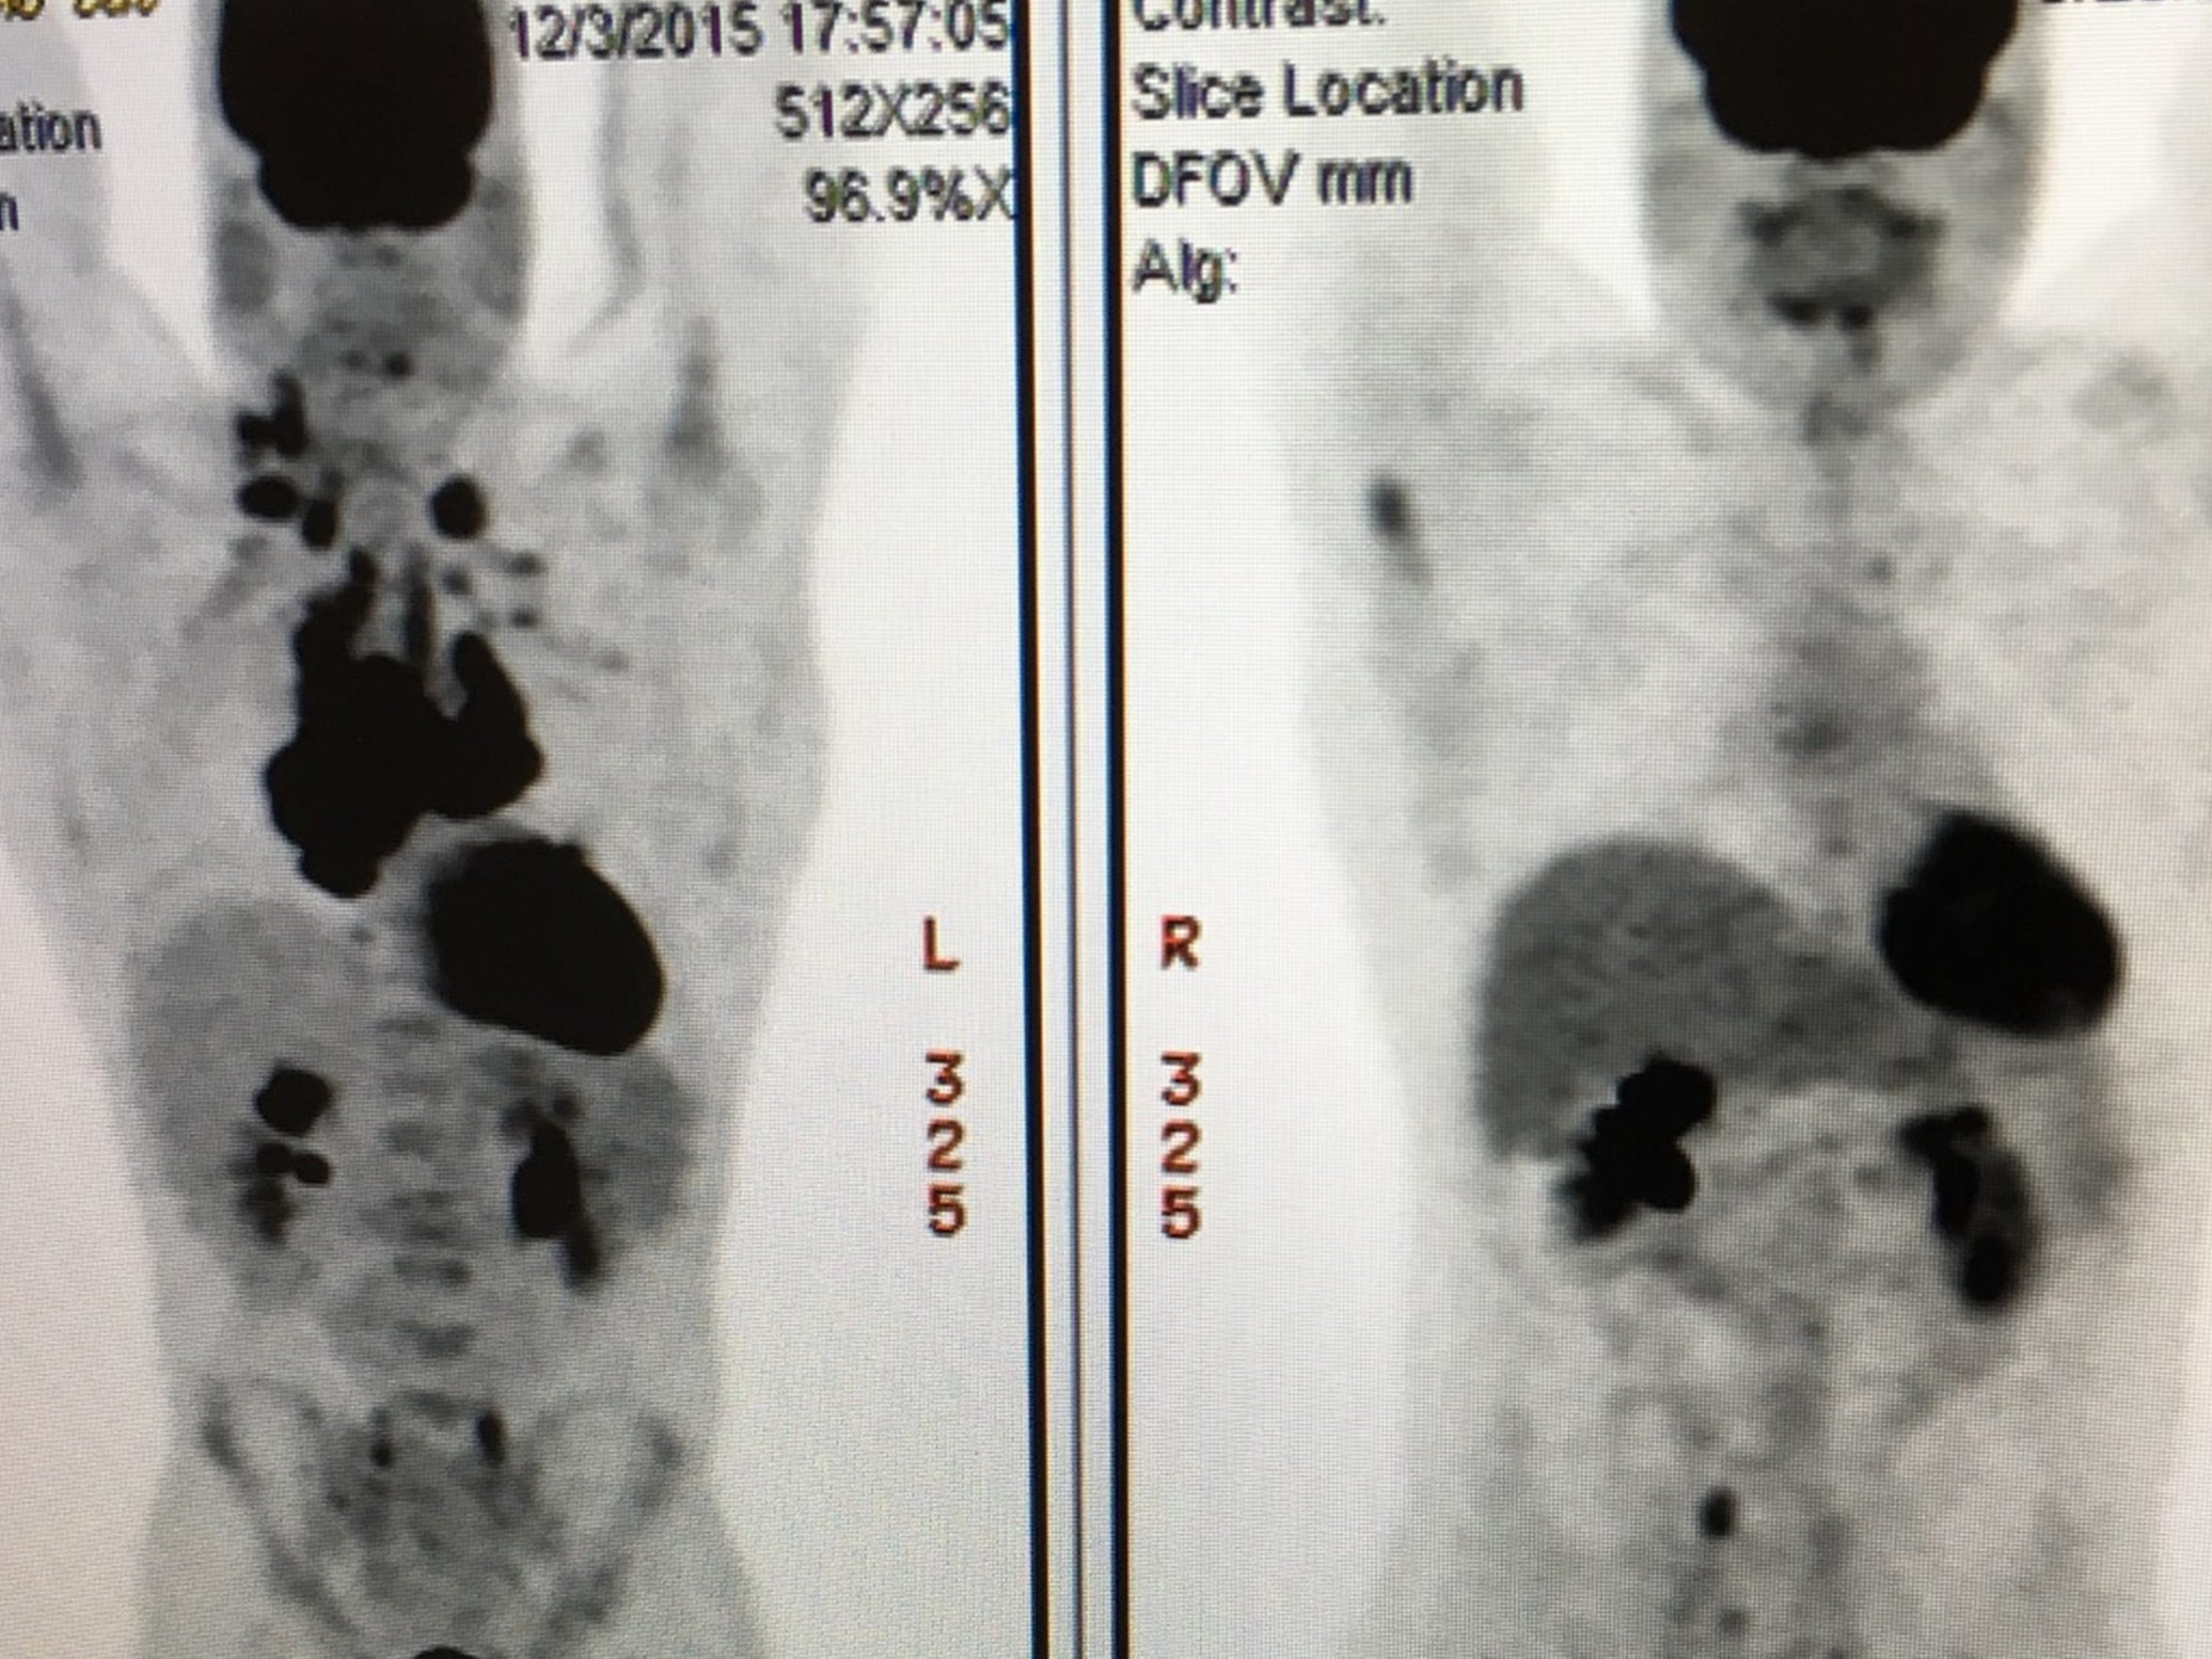 James Conner displays his Dec. 3 pre-chemotherapy scan